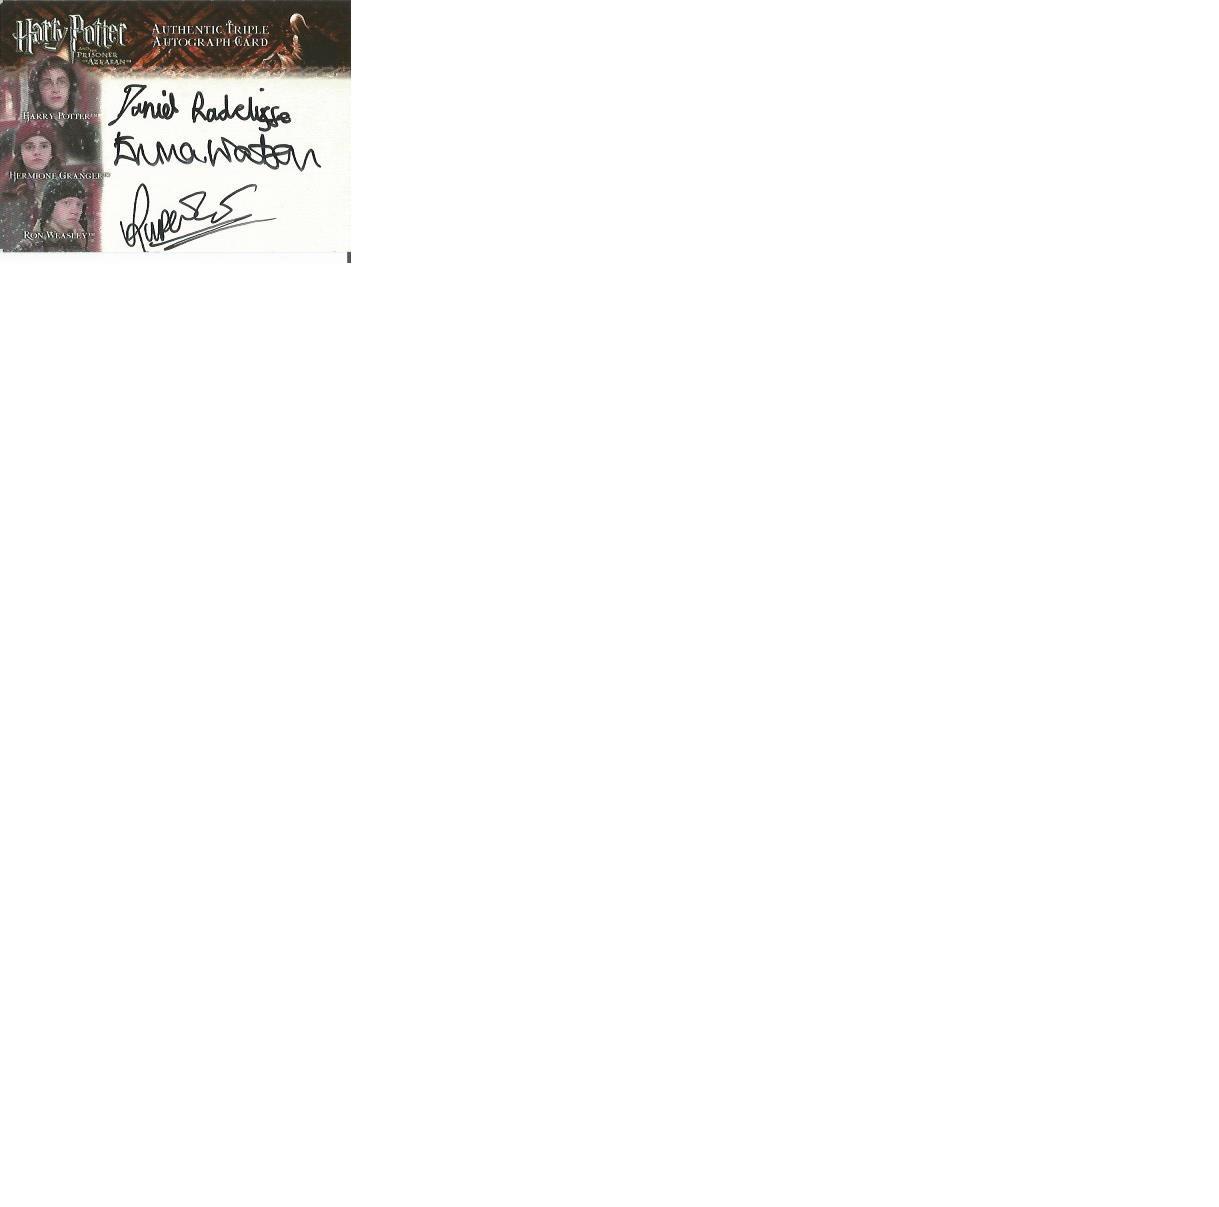 Lot 60 - Daniel Radcliffe, Emma Watson and Rupert Grint signed Harry Potter Prisoner of Azkaban autographed